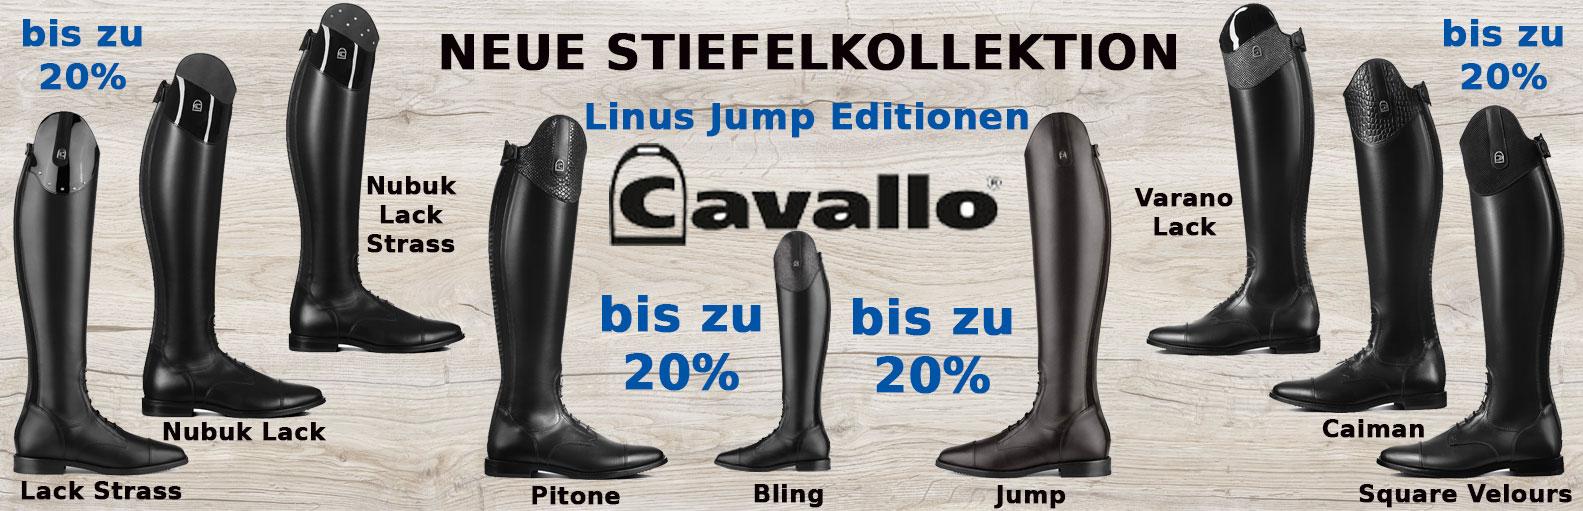 Cavallo Stiefel Angebote